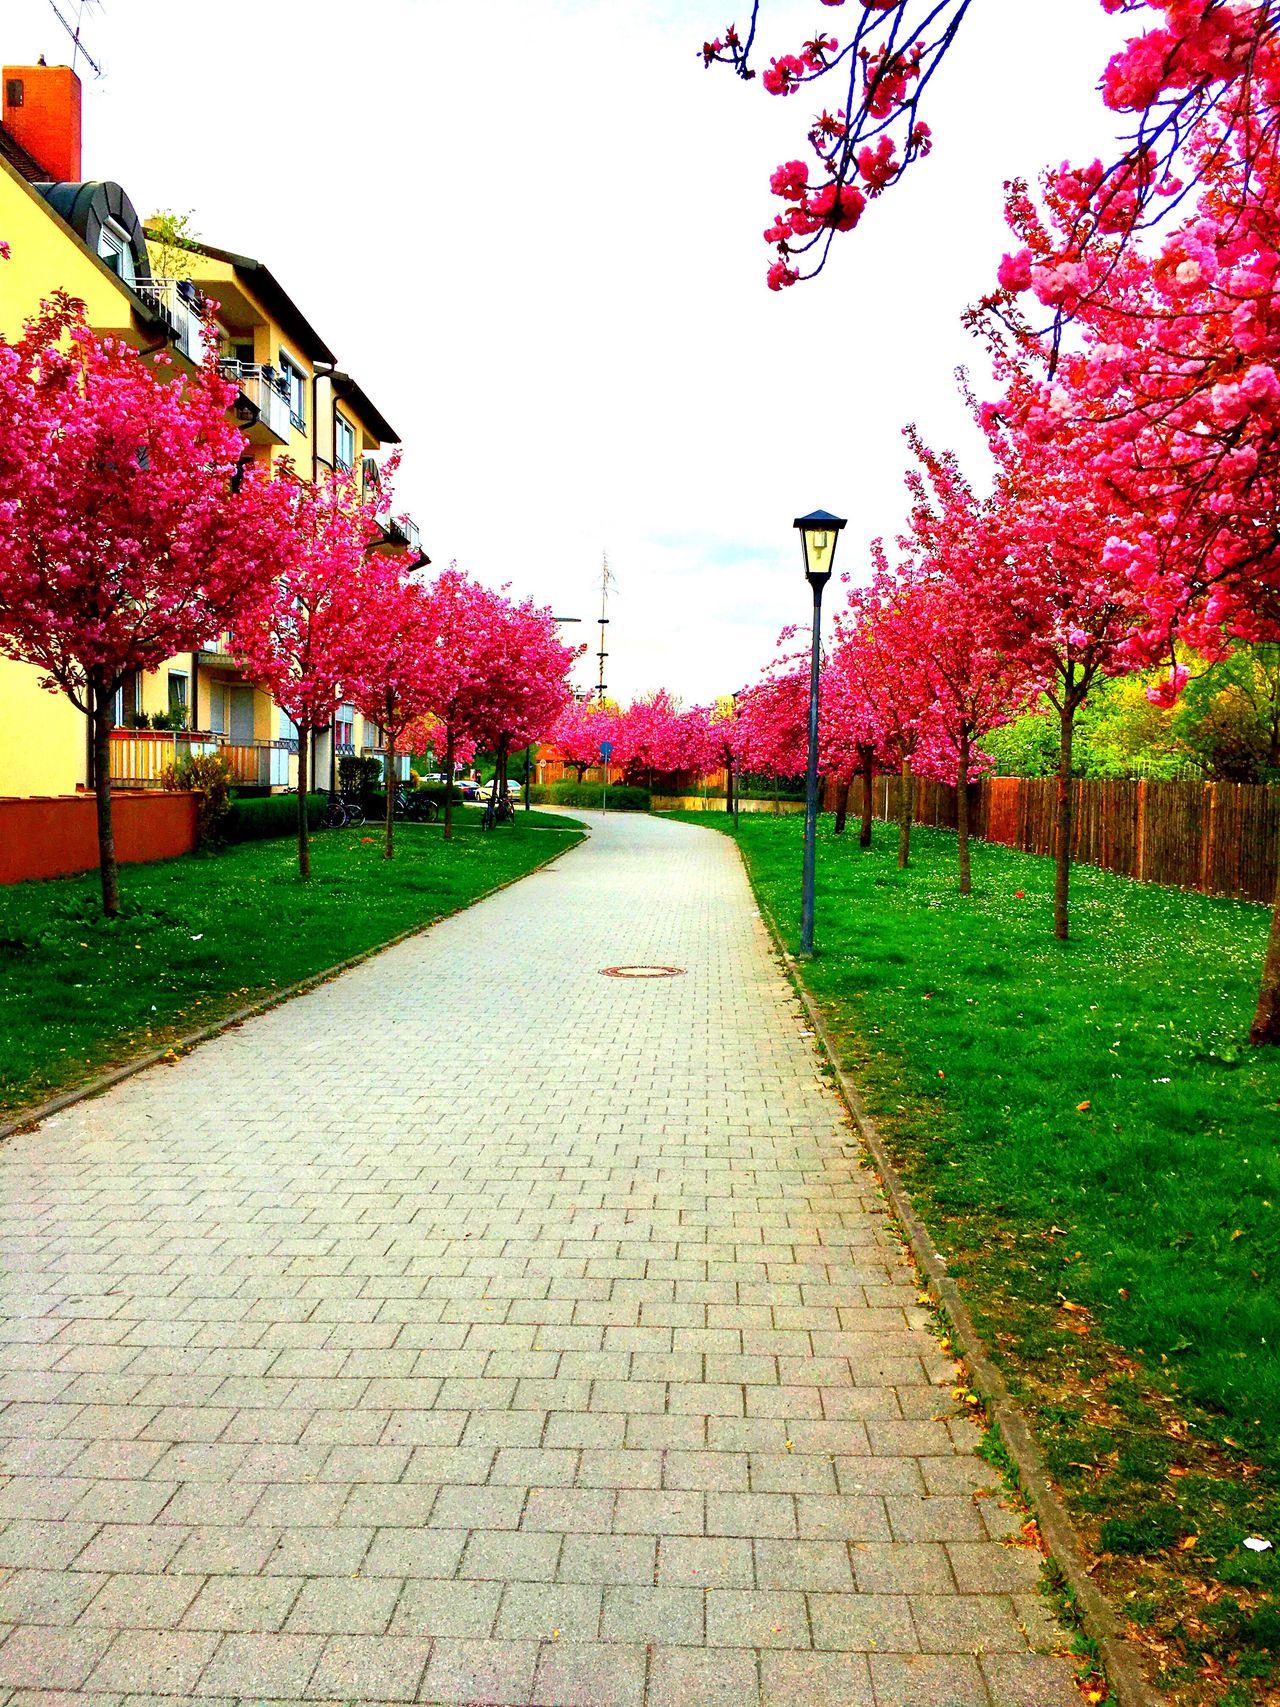 Daylight Filter Munich Leopoldstrasse Home After Work